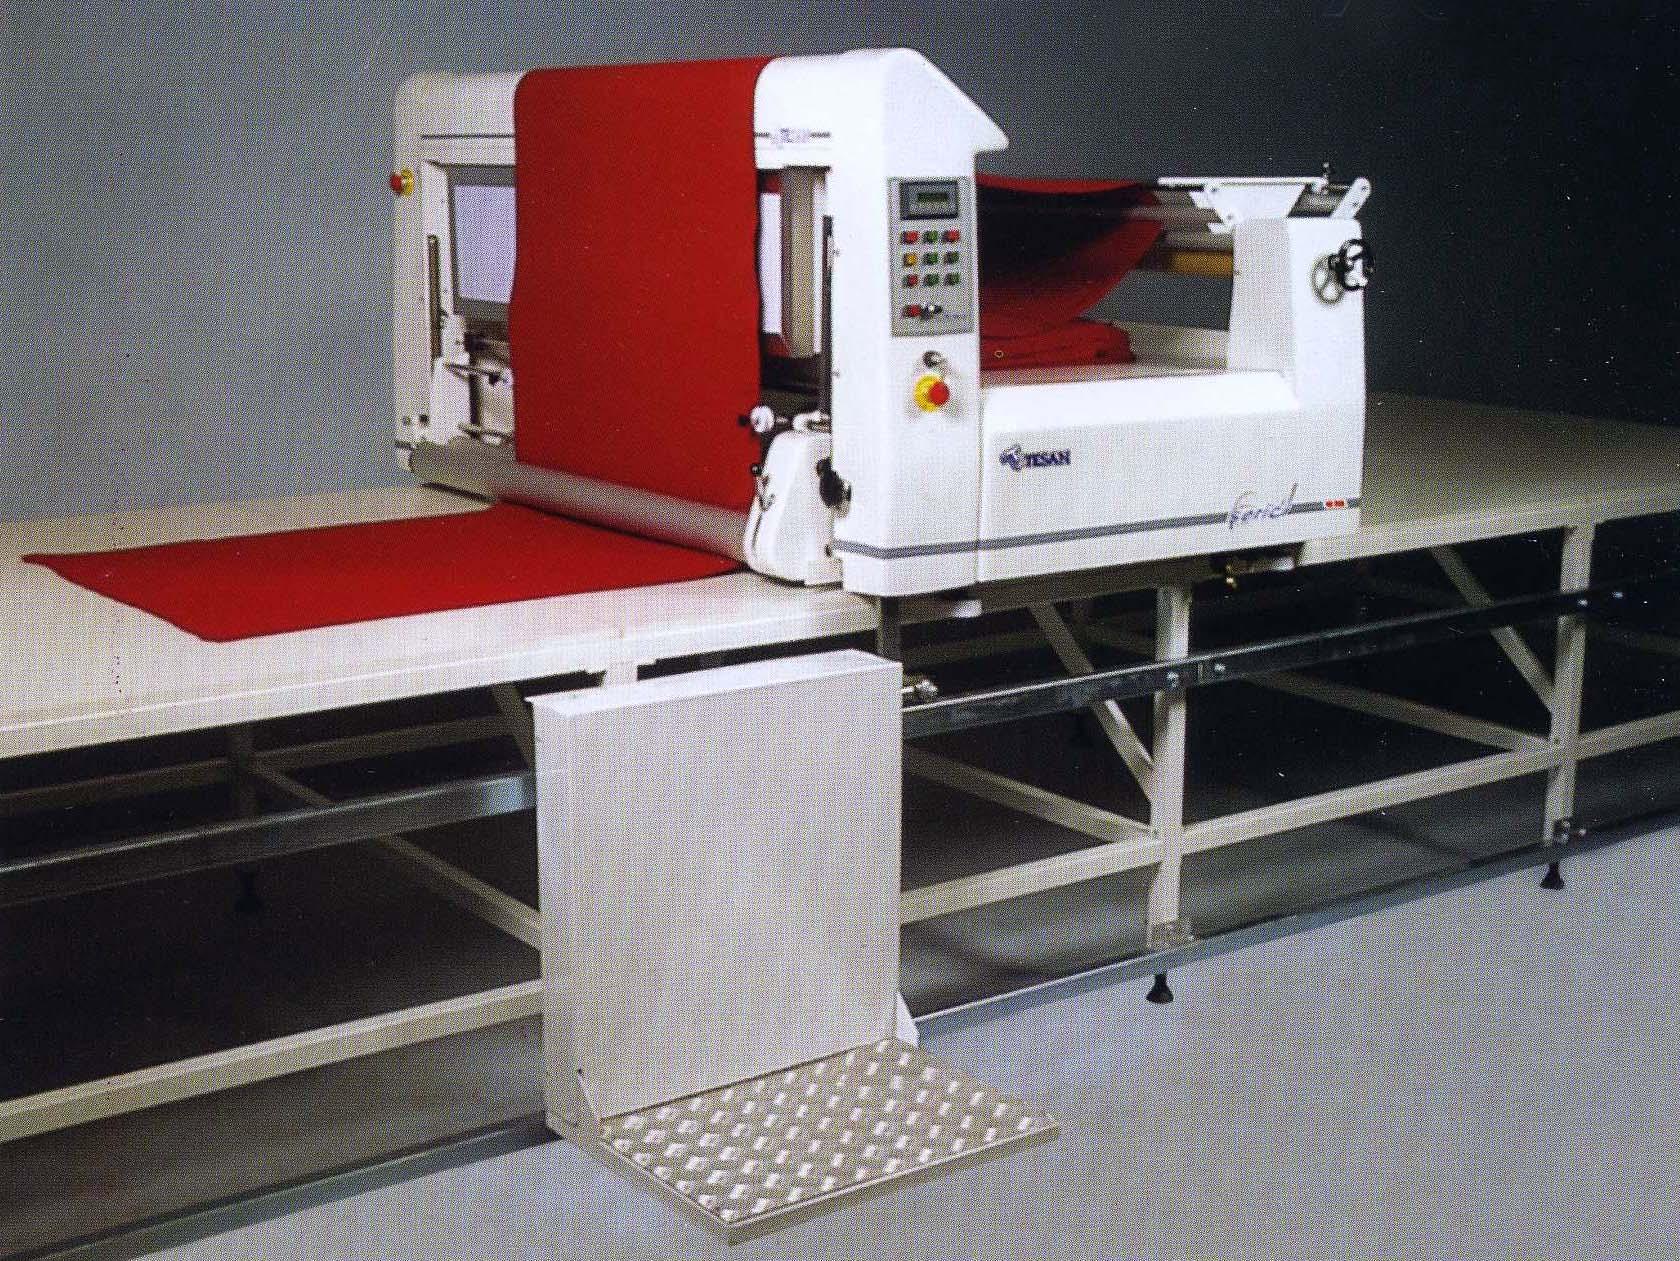 Автоматическая брикетная настилочная машина TESAN TS 100 E